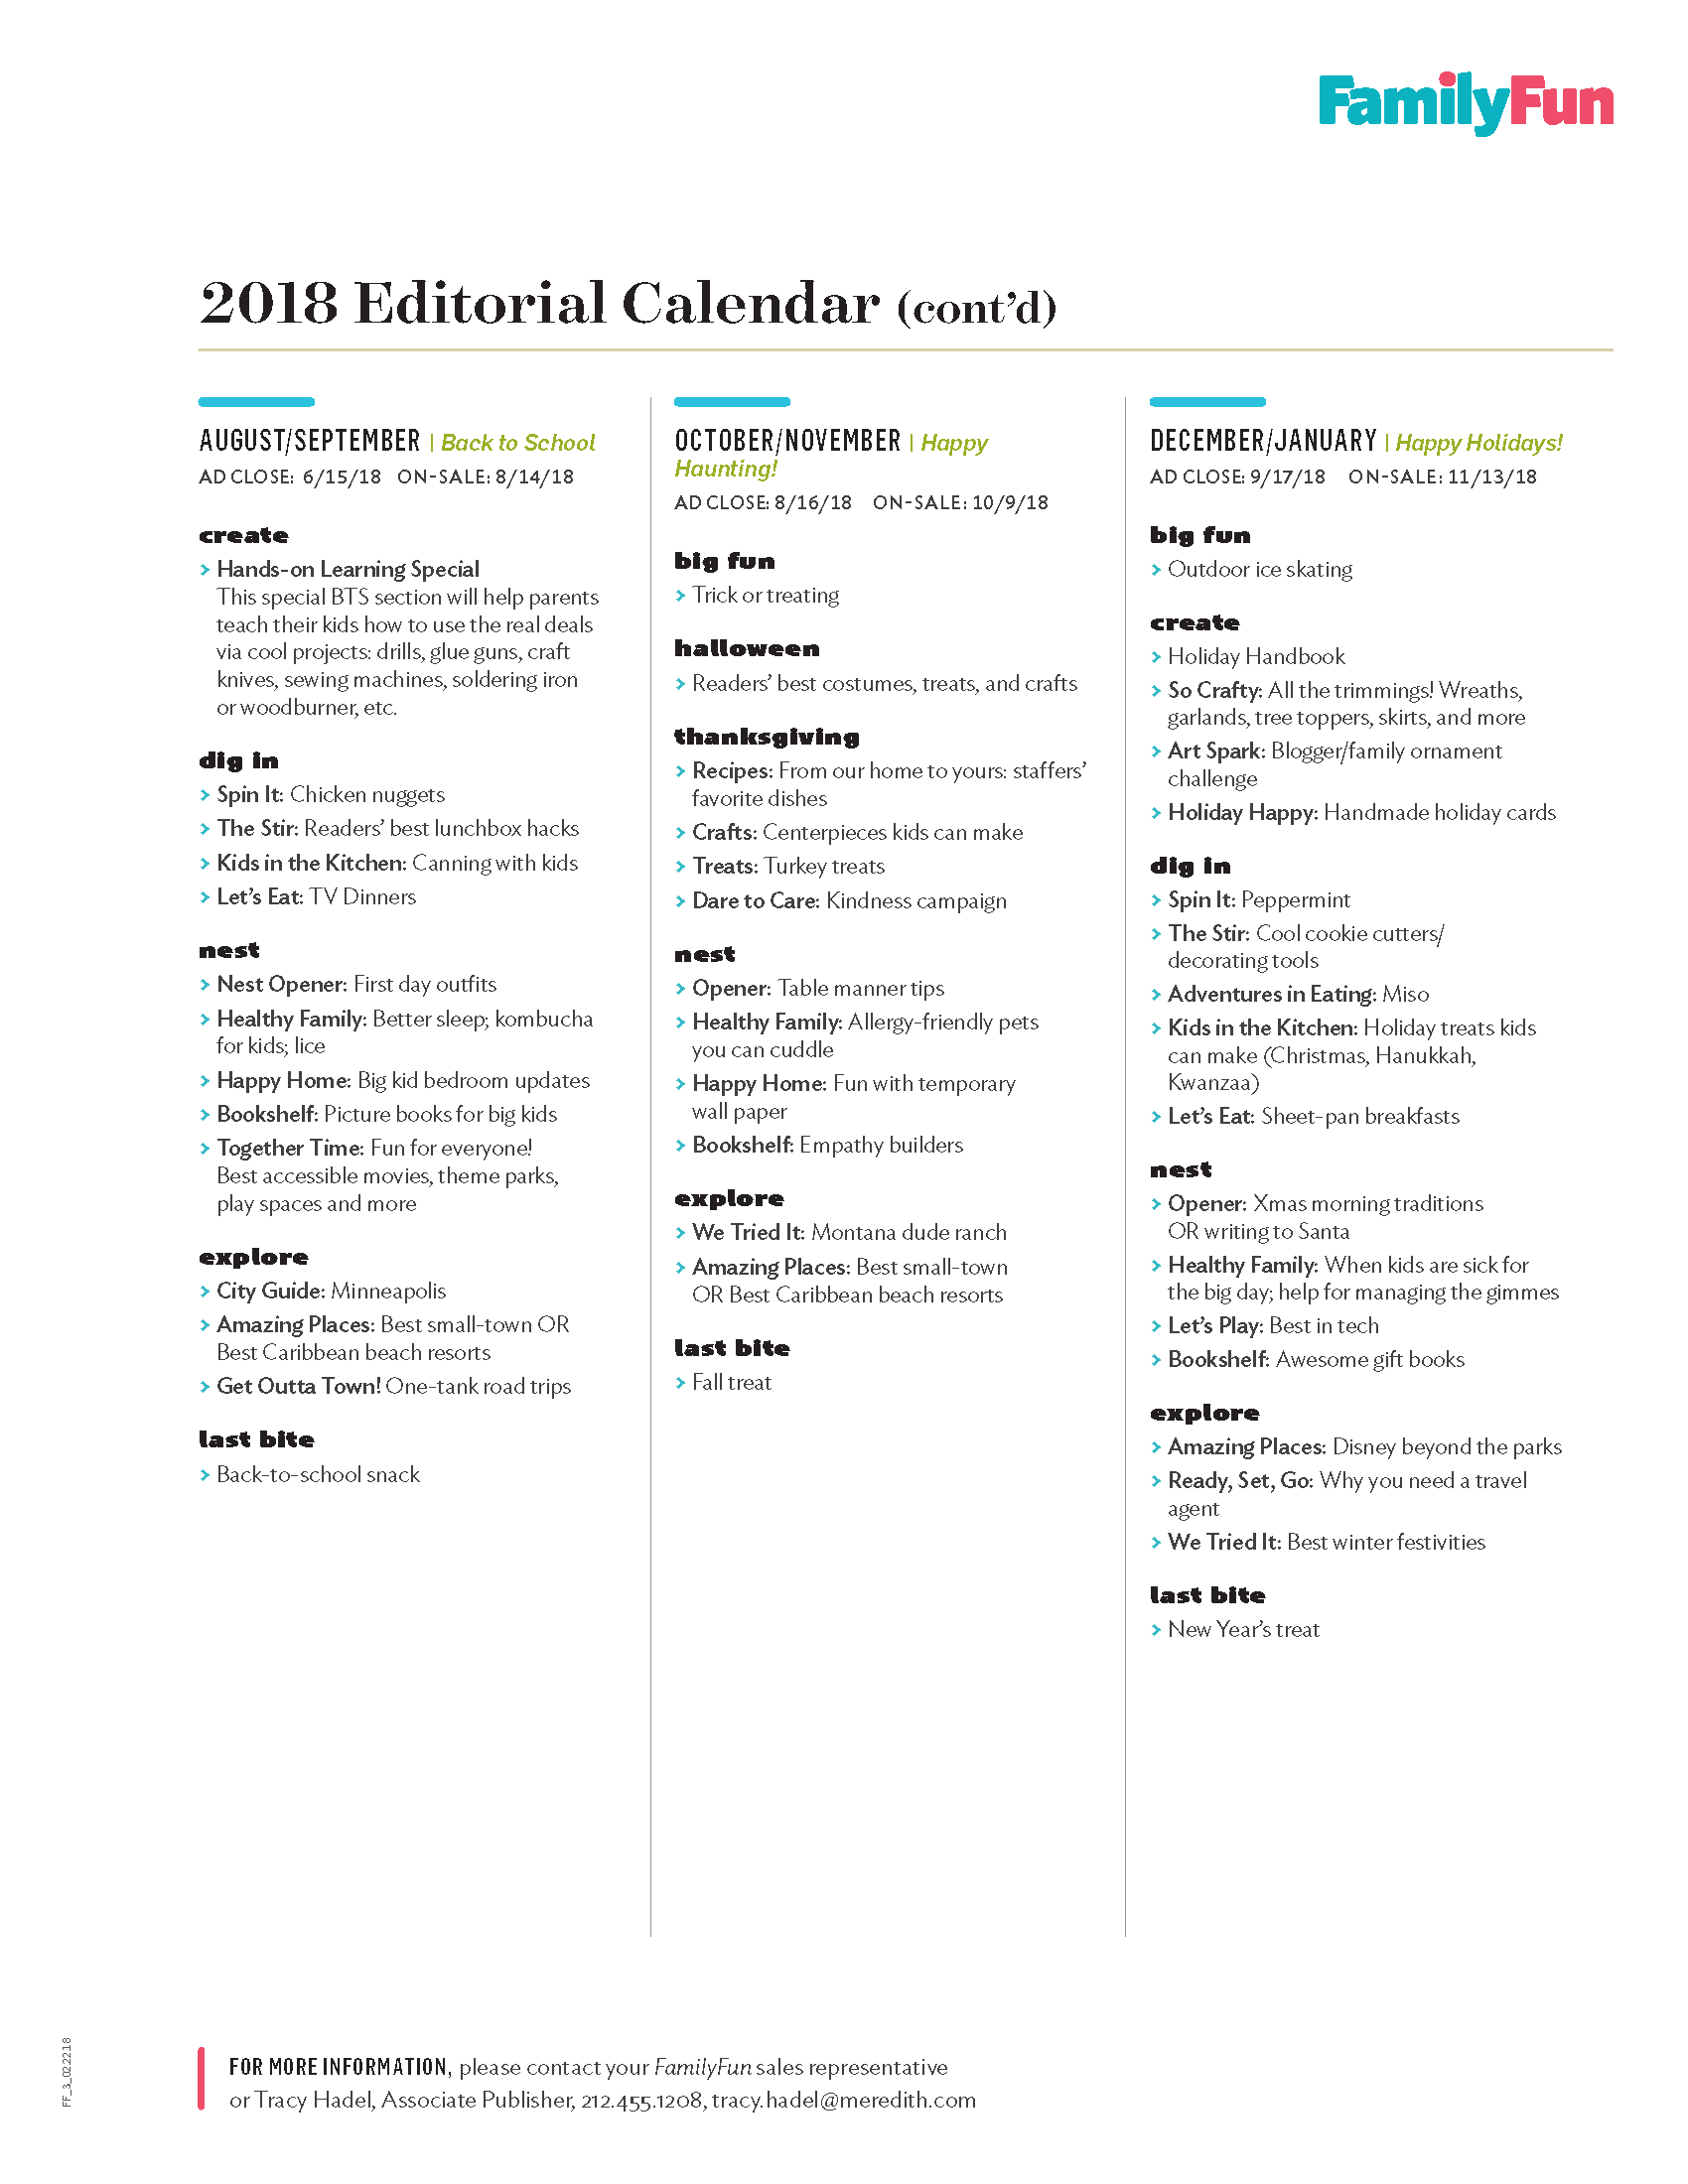 FF_EditCalendar_2018_022318_Page_2.png